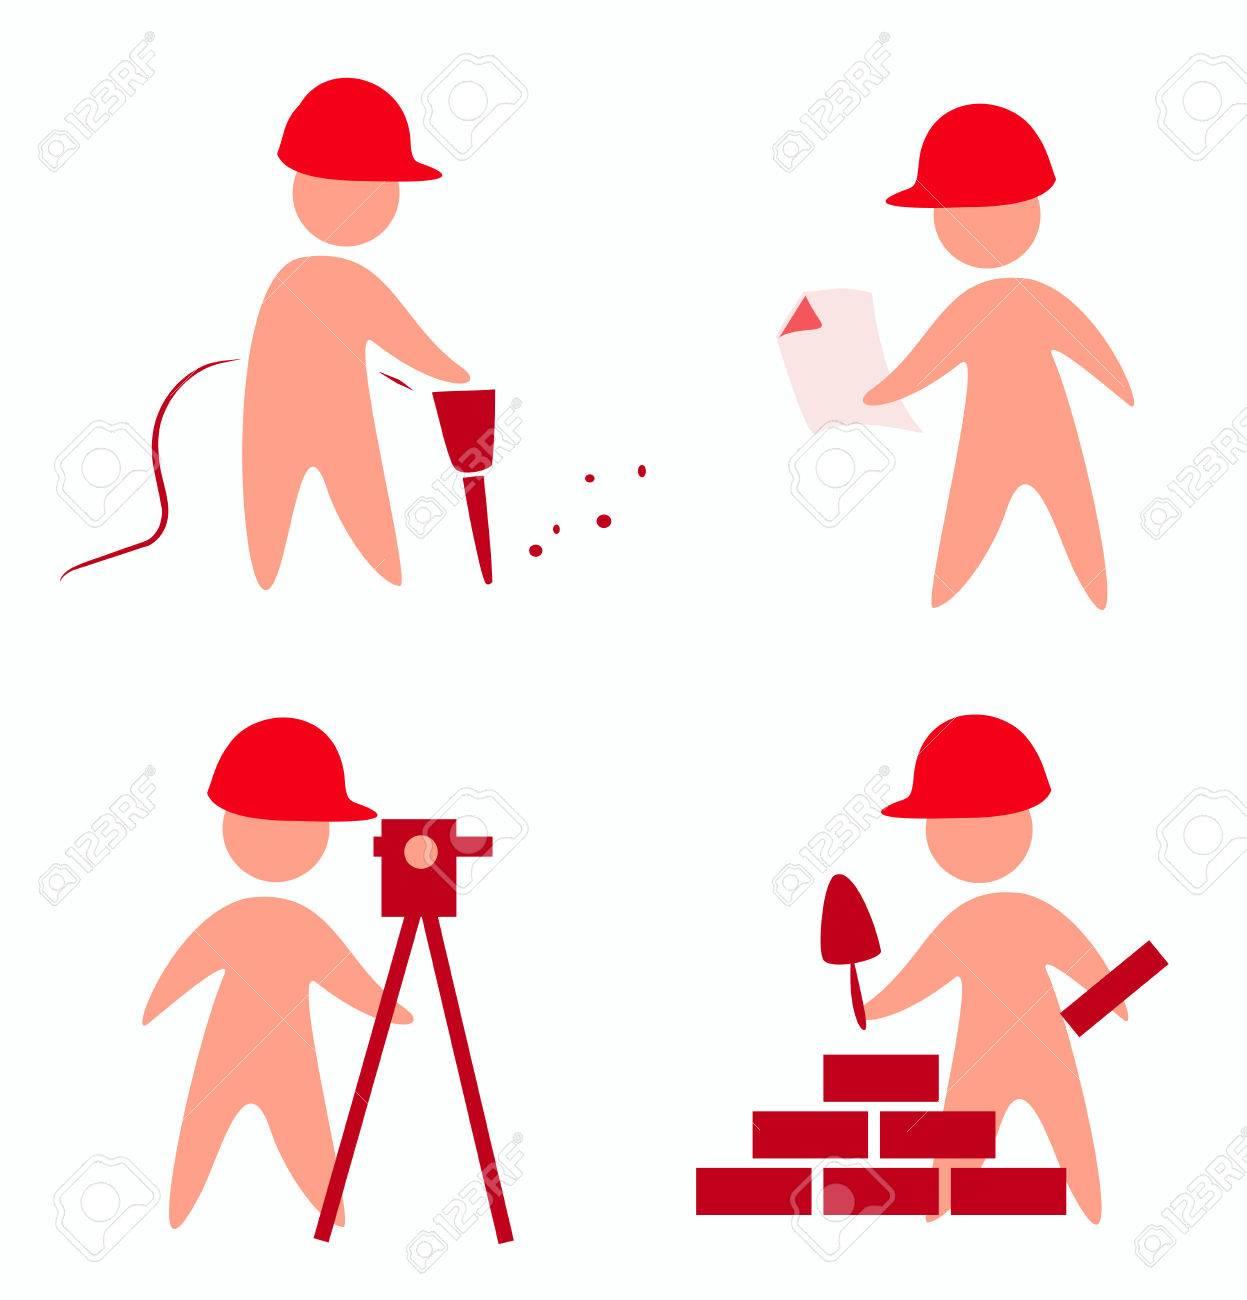 builders icons in simple figures Stock Vector - 22348406